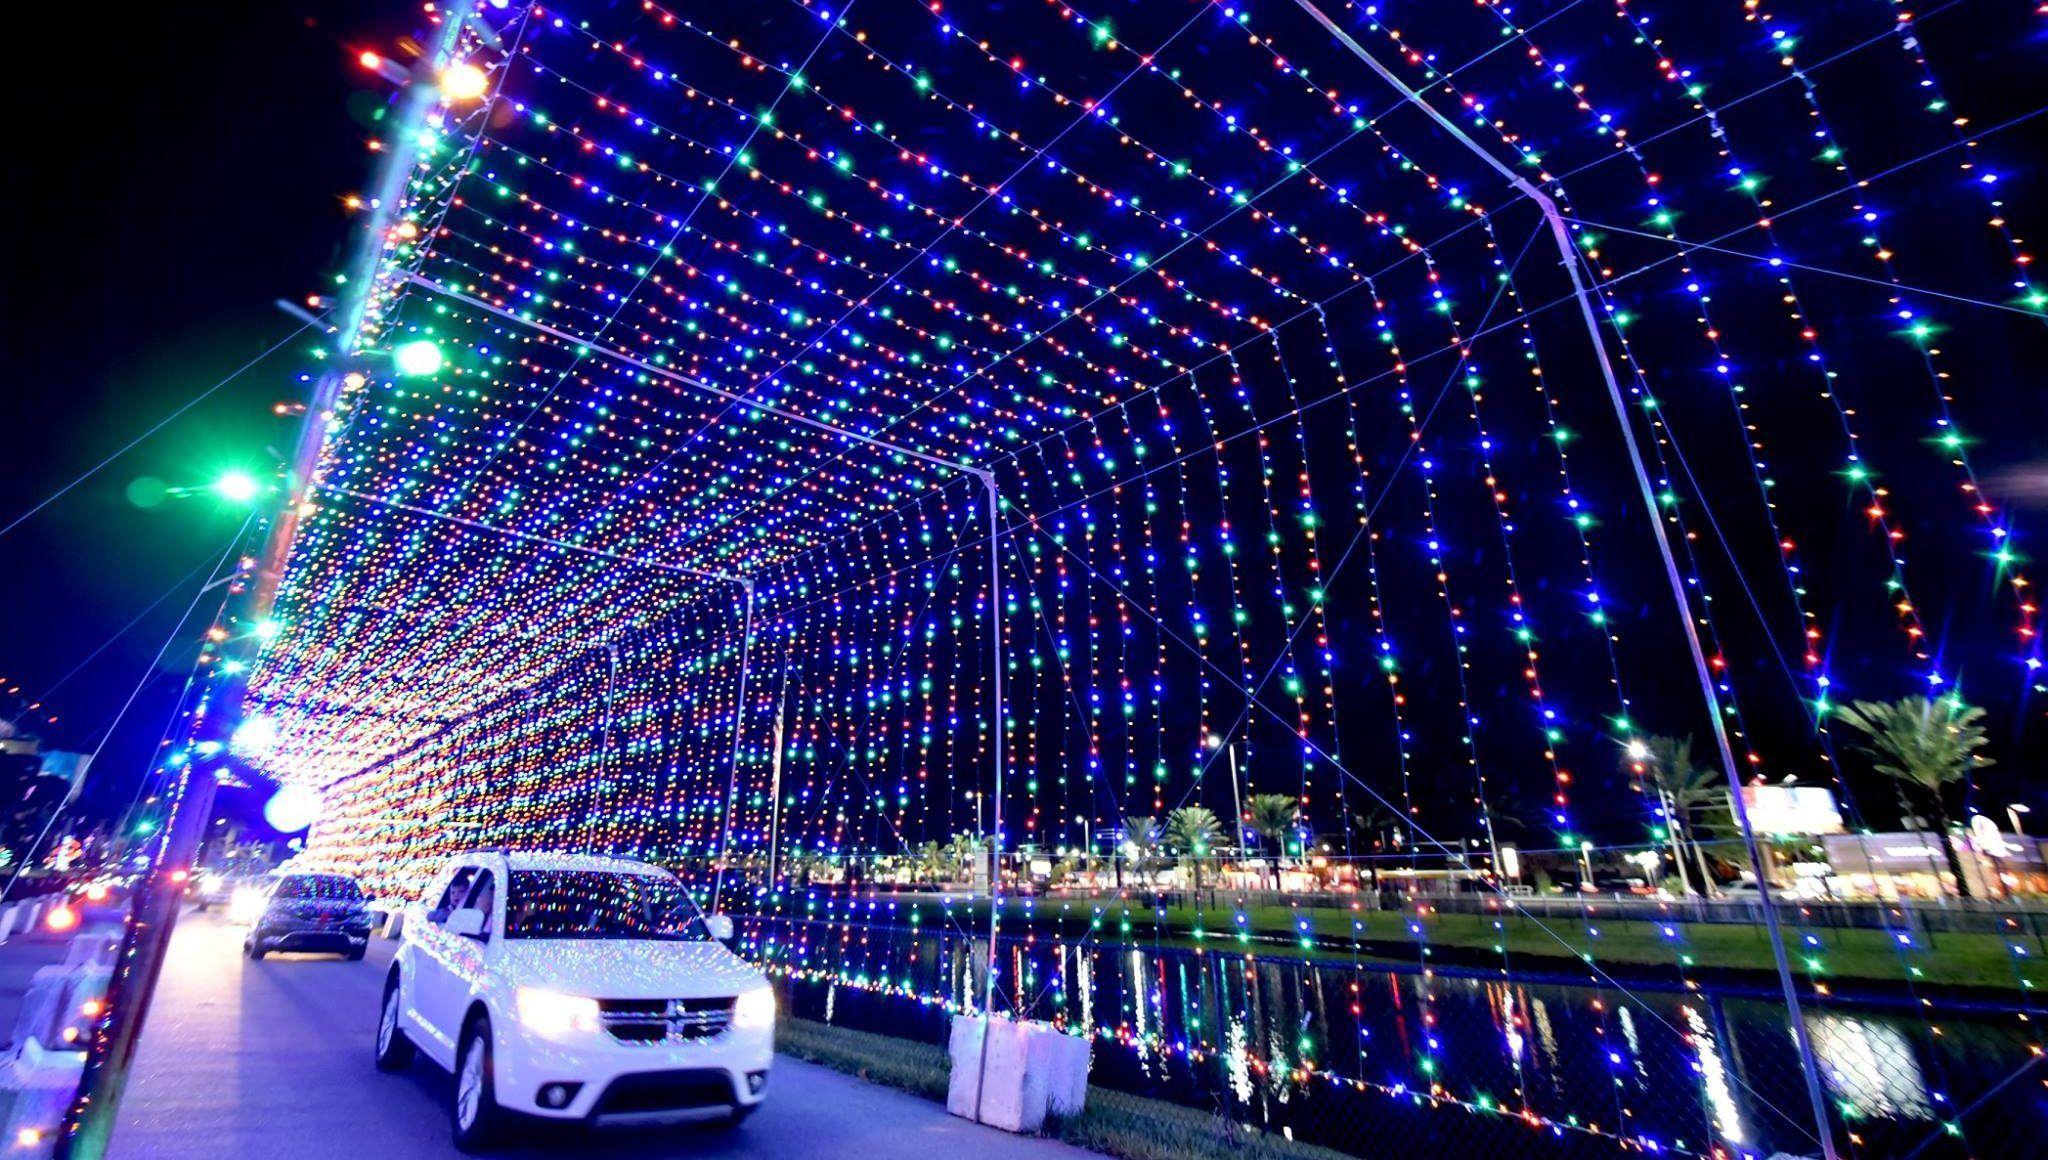 Take A Dreamy Ride Through The Largest DriveThru Light